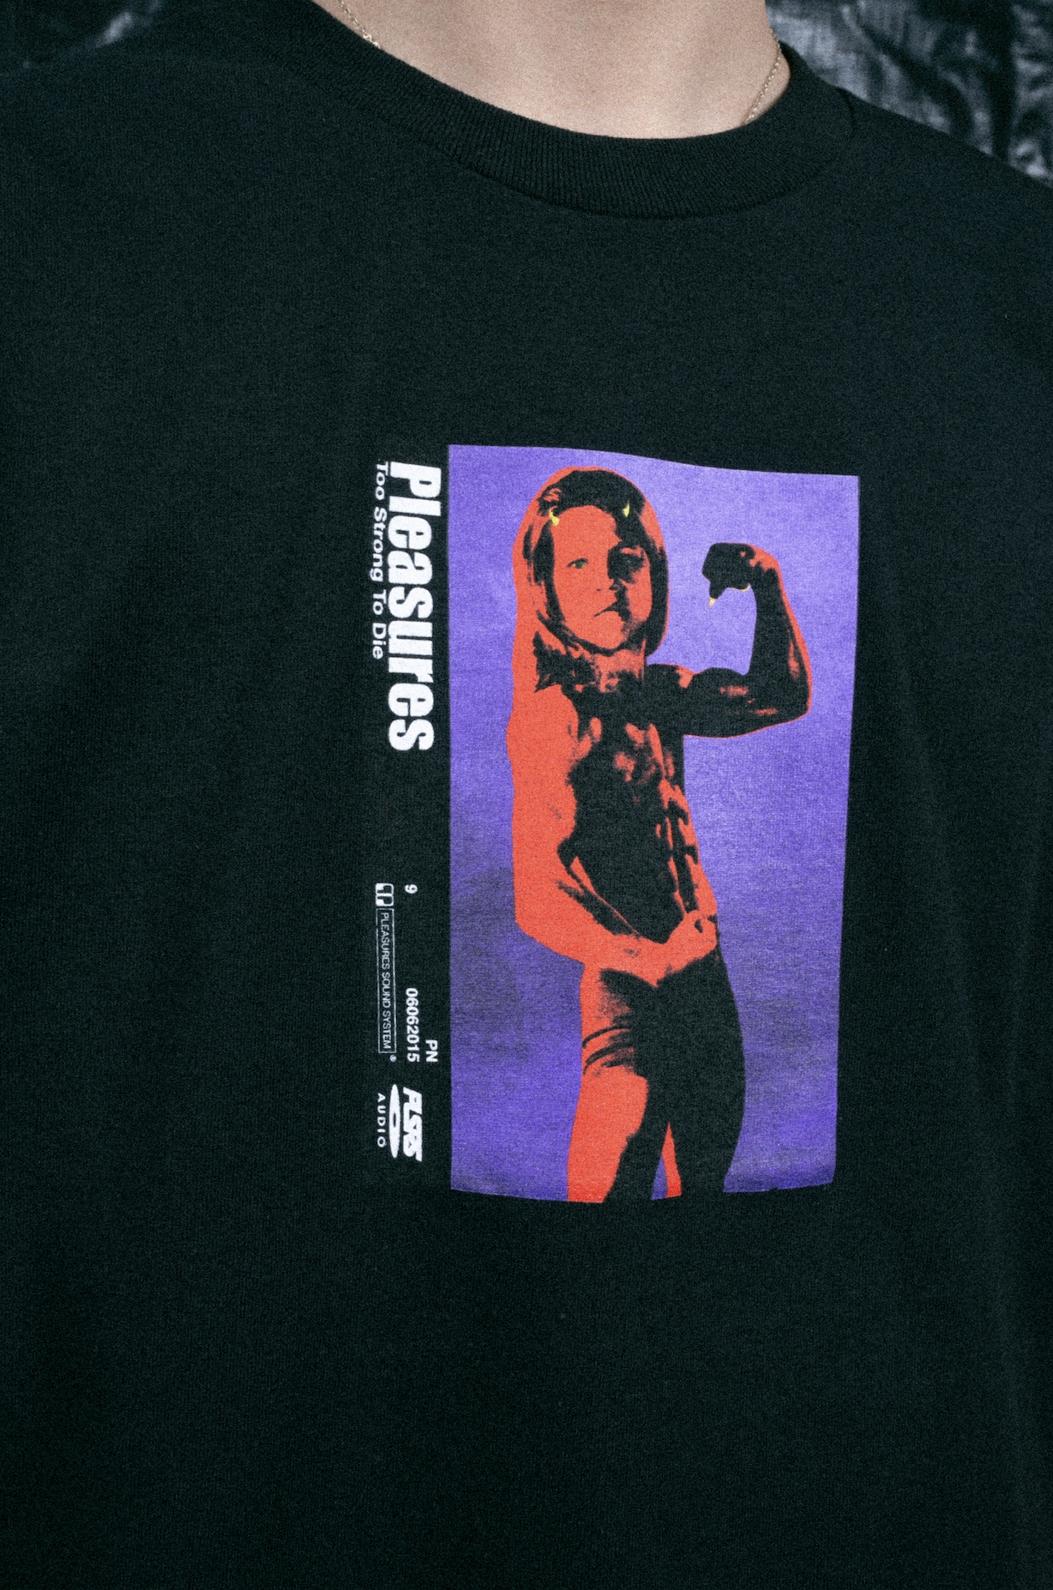 【PLEASURES/プレジャーズ】2 STRONG 2 DIE T-SHIRT Tシャツ /  BLACK